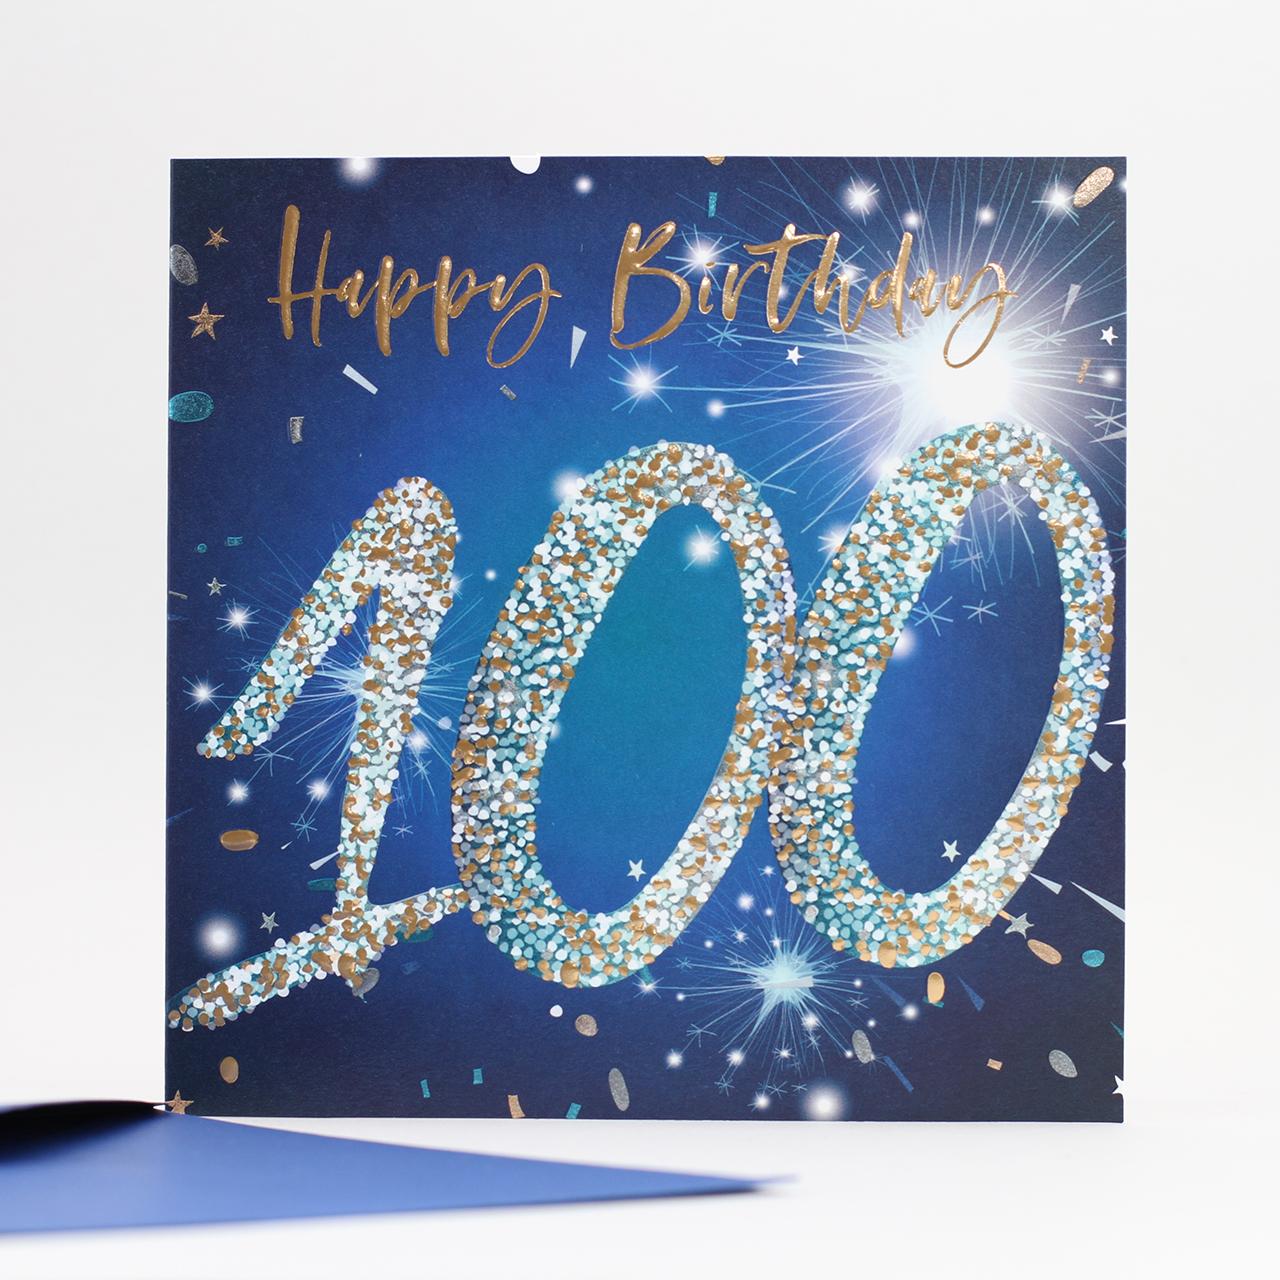 Belly Button Designs 100th Birthday Blue